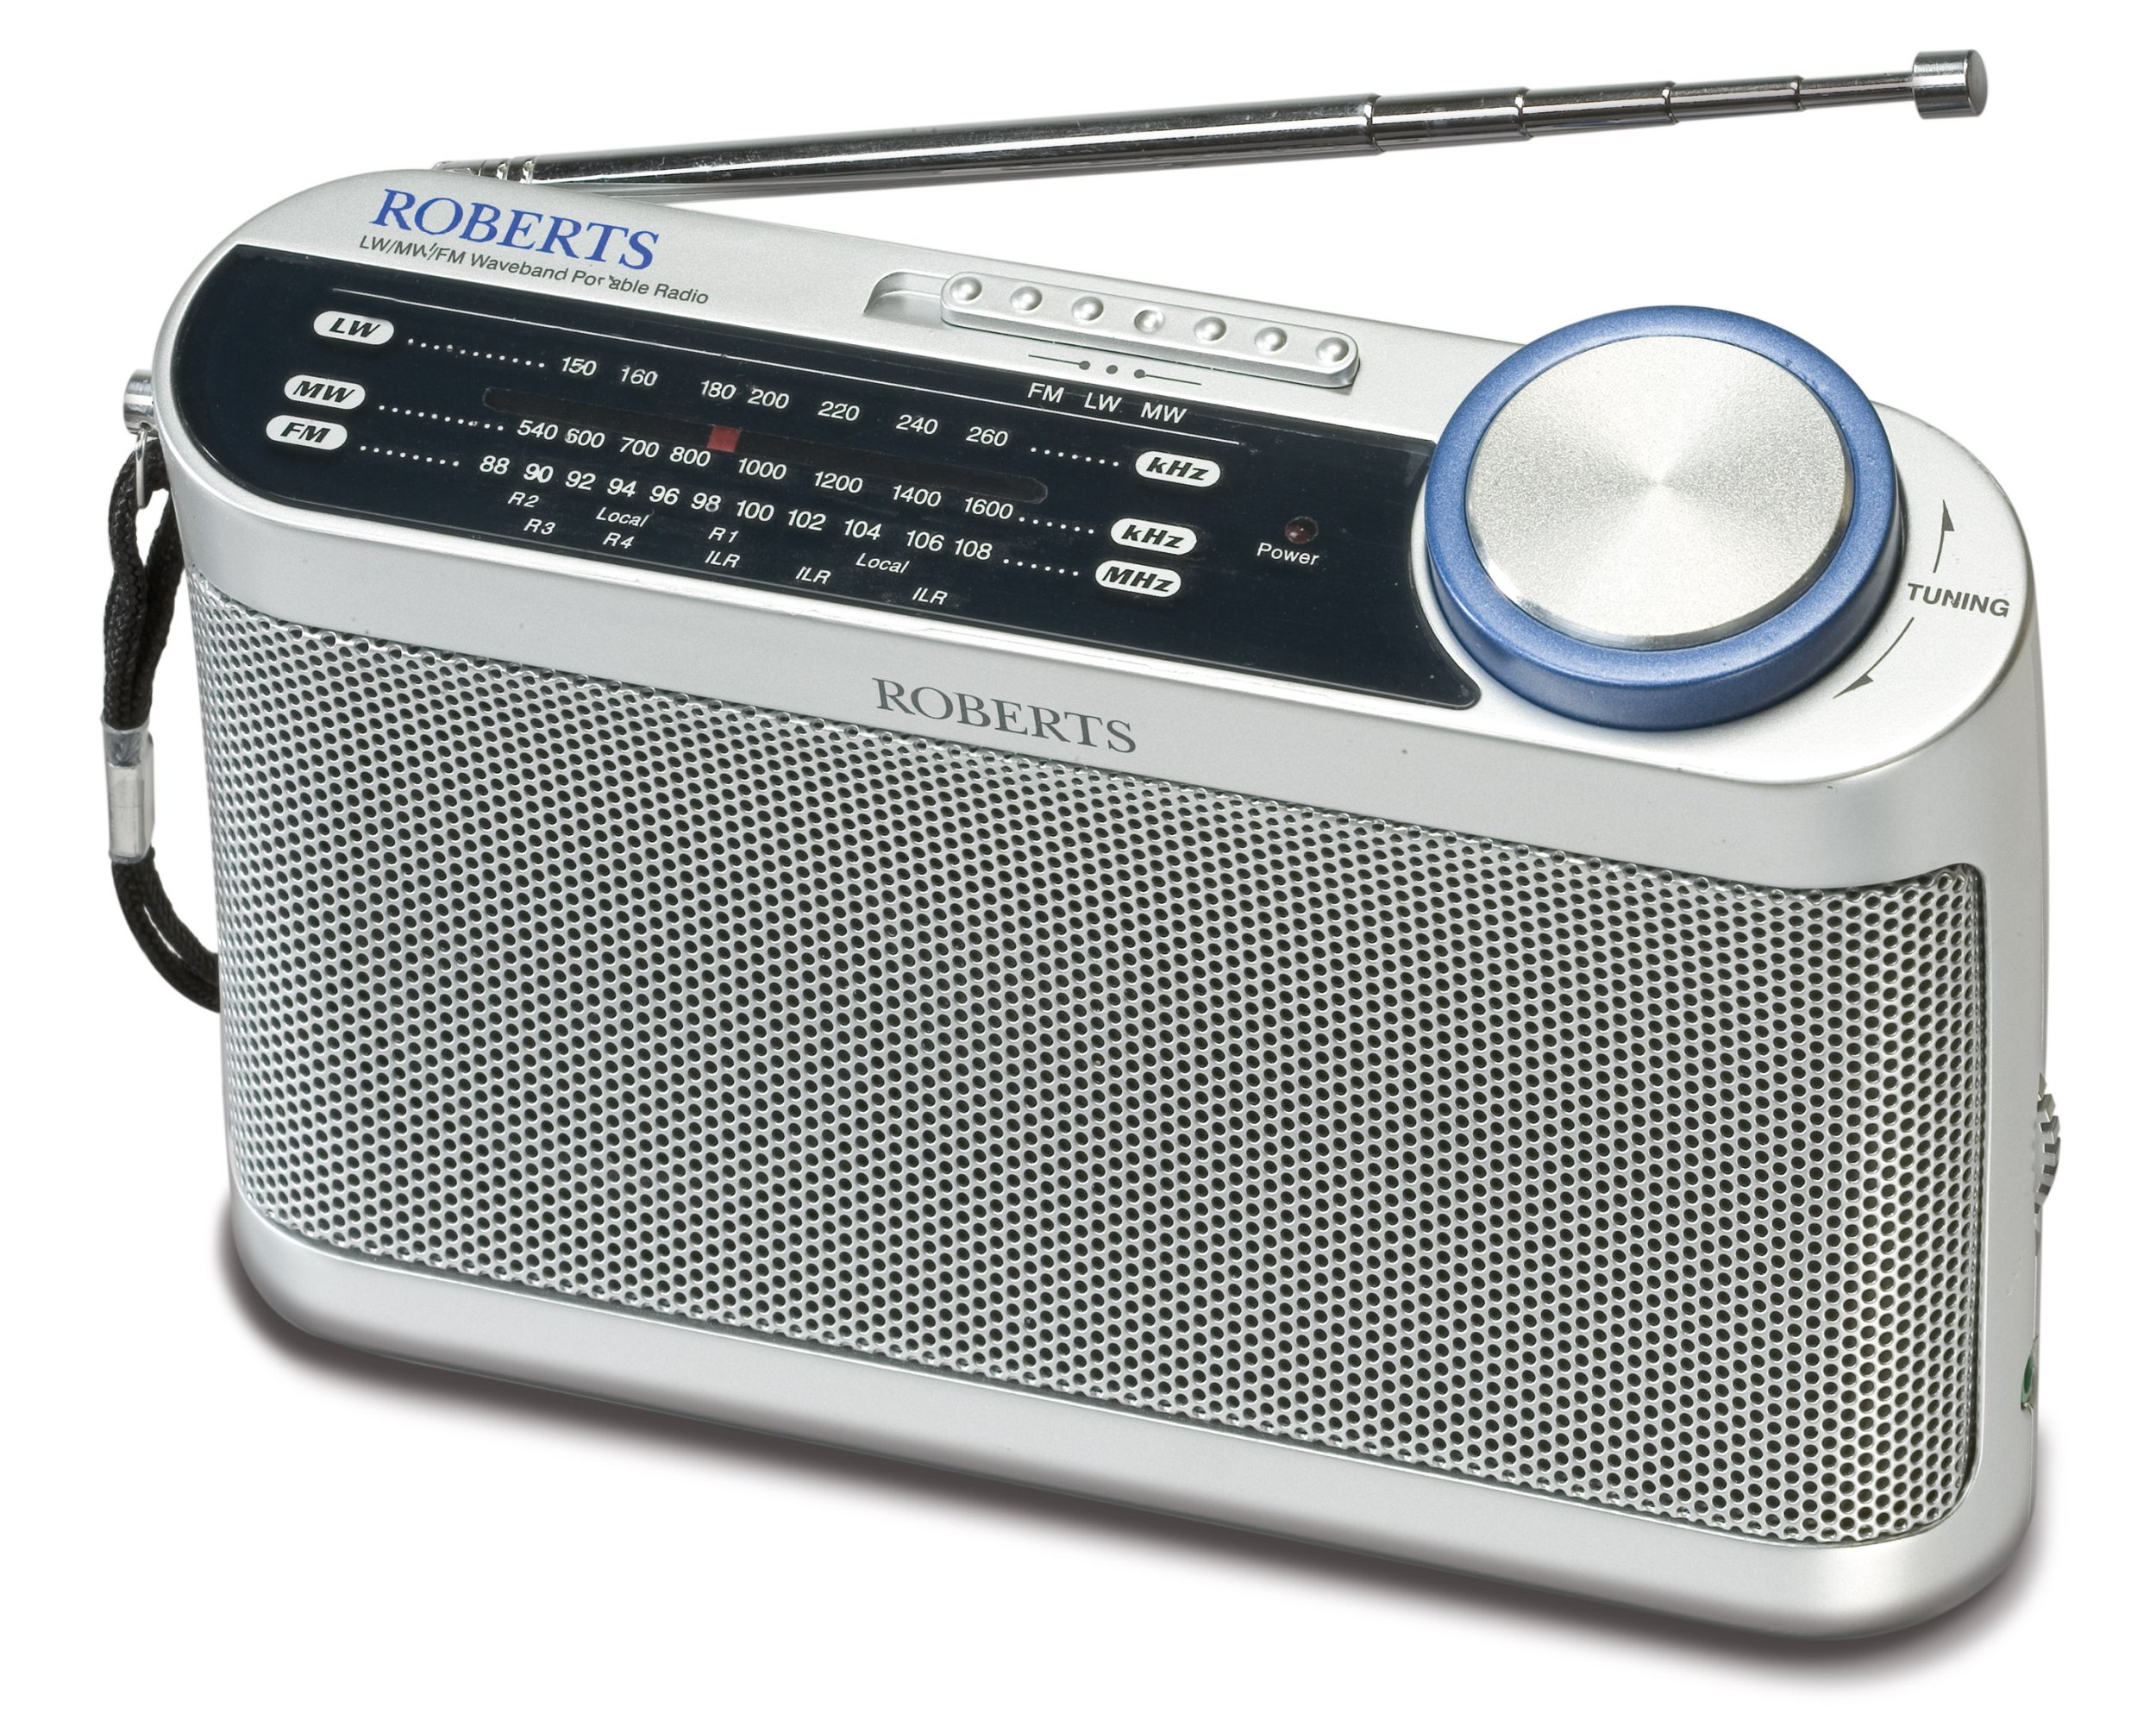 Roberts Radio R9993 Portable LW/MW/FM Radio with Headphone Socket 1